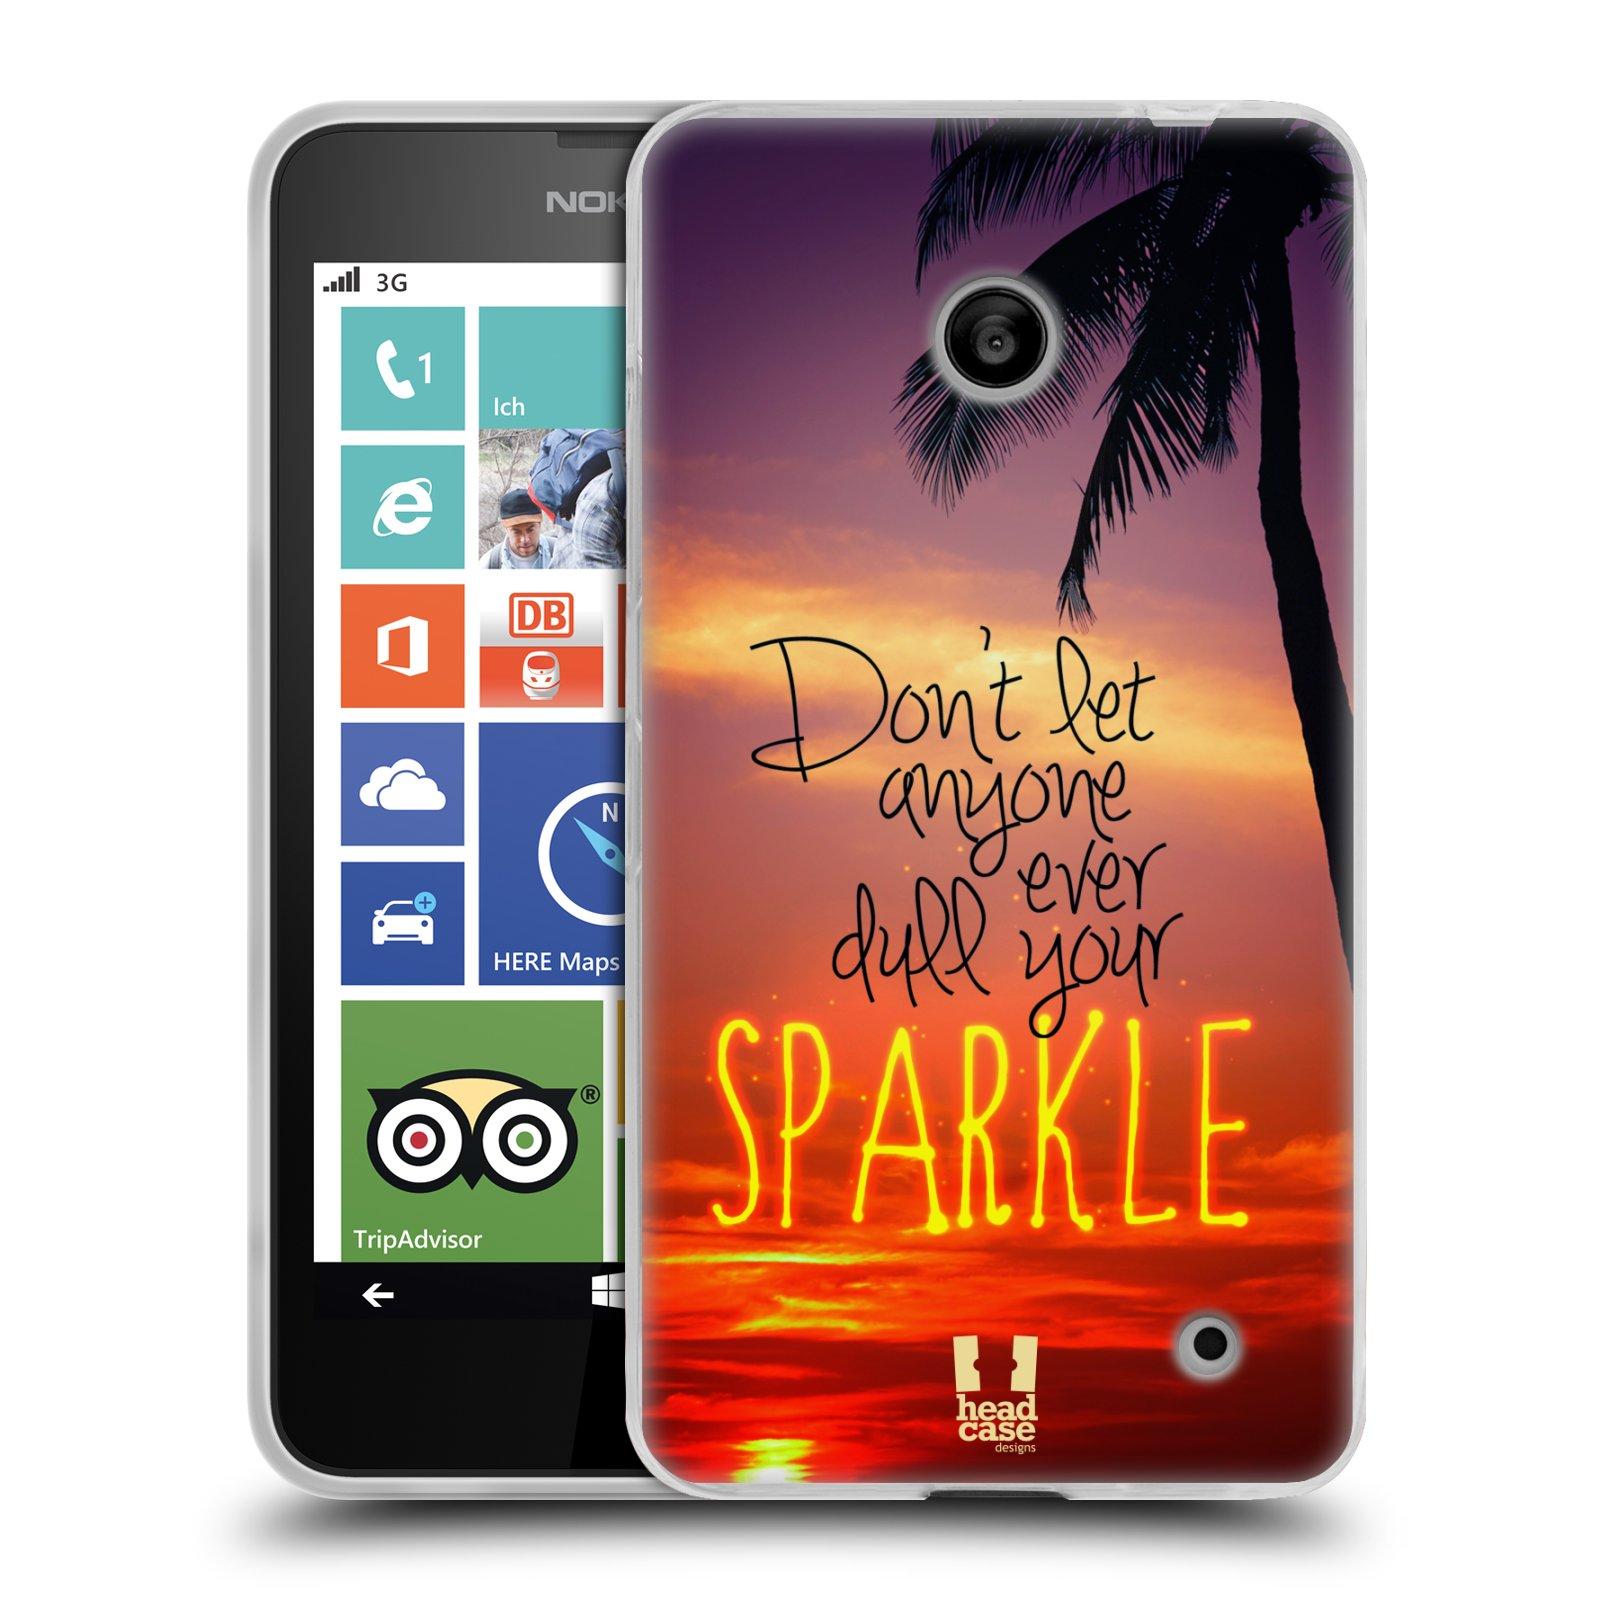 Silikonové pouzdro na mobil Nokia Lumia 630 HEAD CASE SPARKLE (Silikonový kryt či obal na mobilní telefon Nokia Lumia 630 a Nokia Lumia 630 Dual SIM)